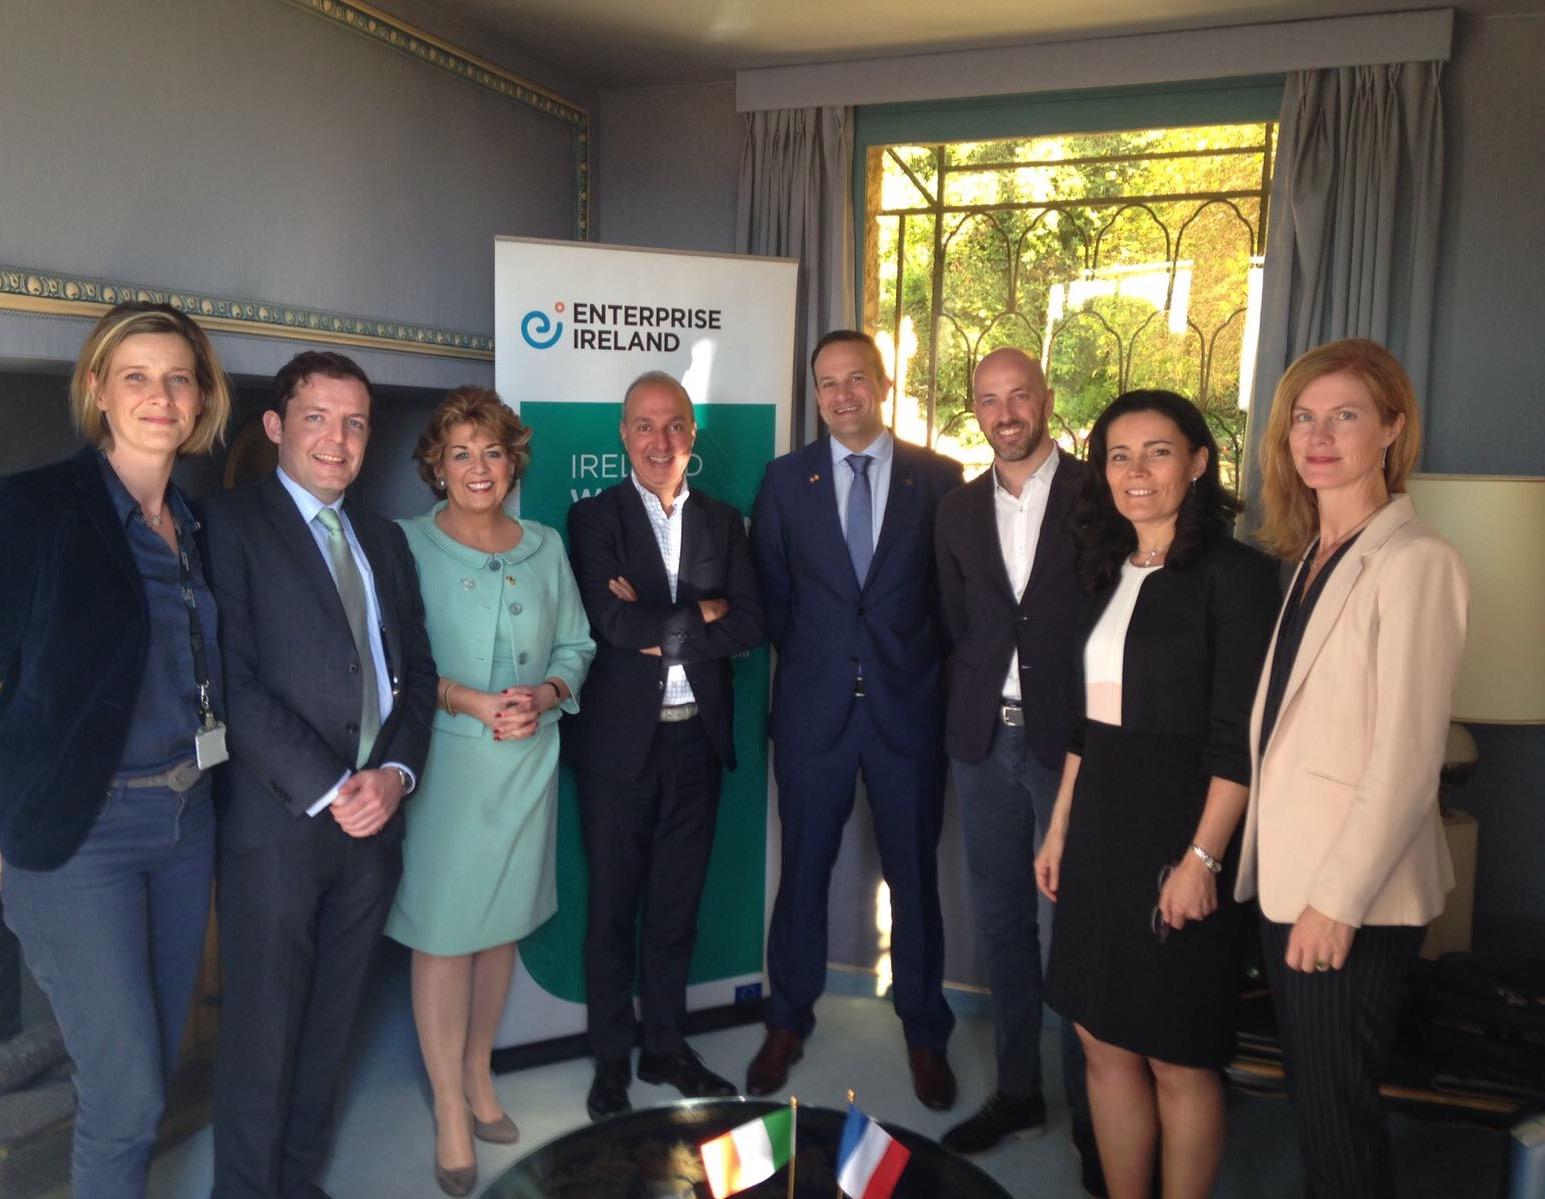 Enterprise Ireland Cannes Minister Ambassador 17 March 2017.jpg